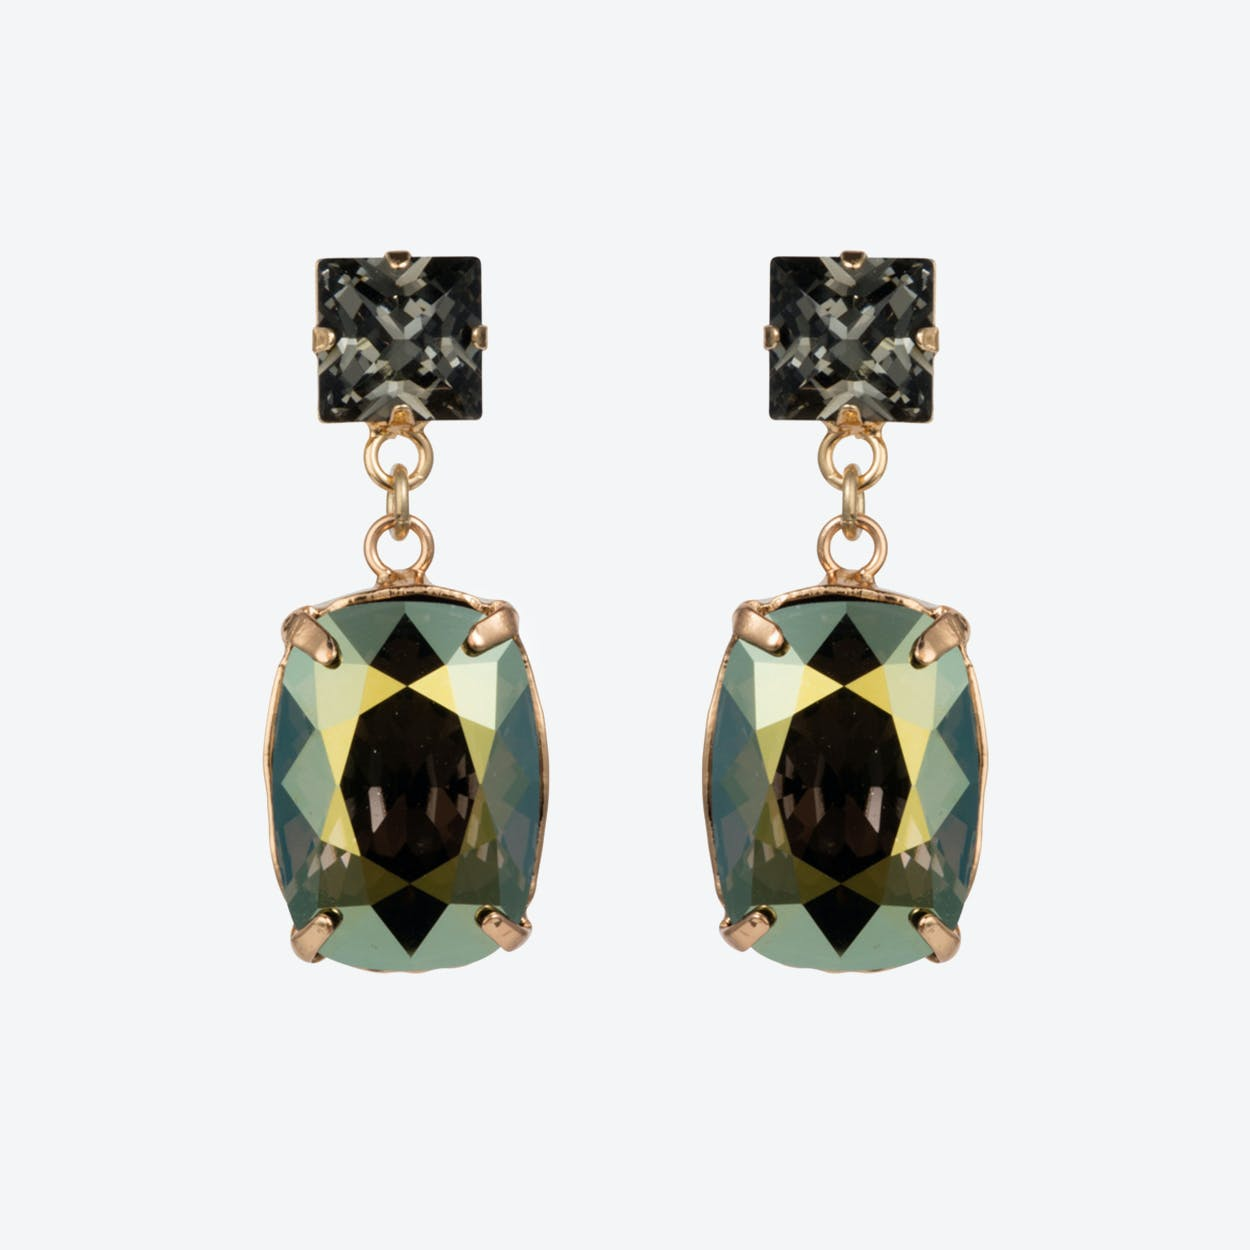 Rectangular Drop Stone Earrings Iridescent Green